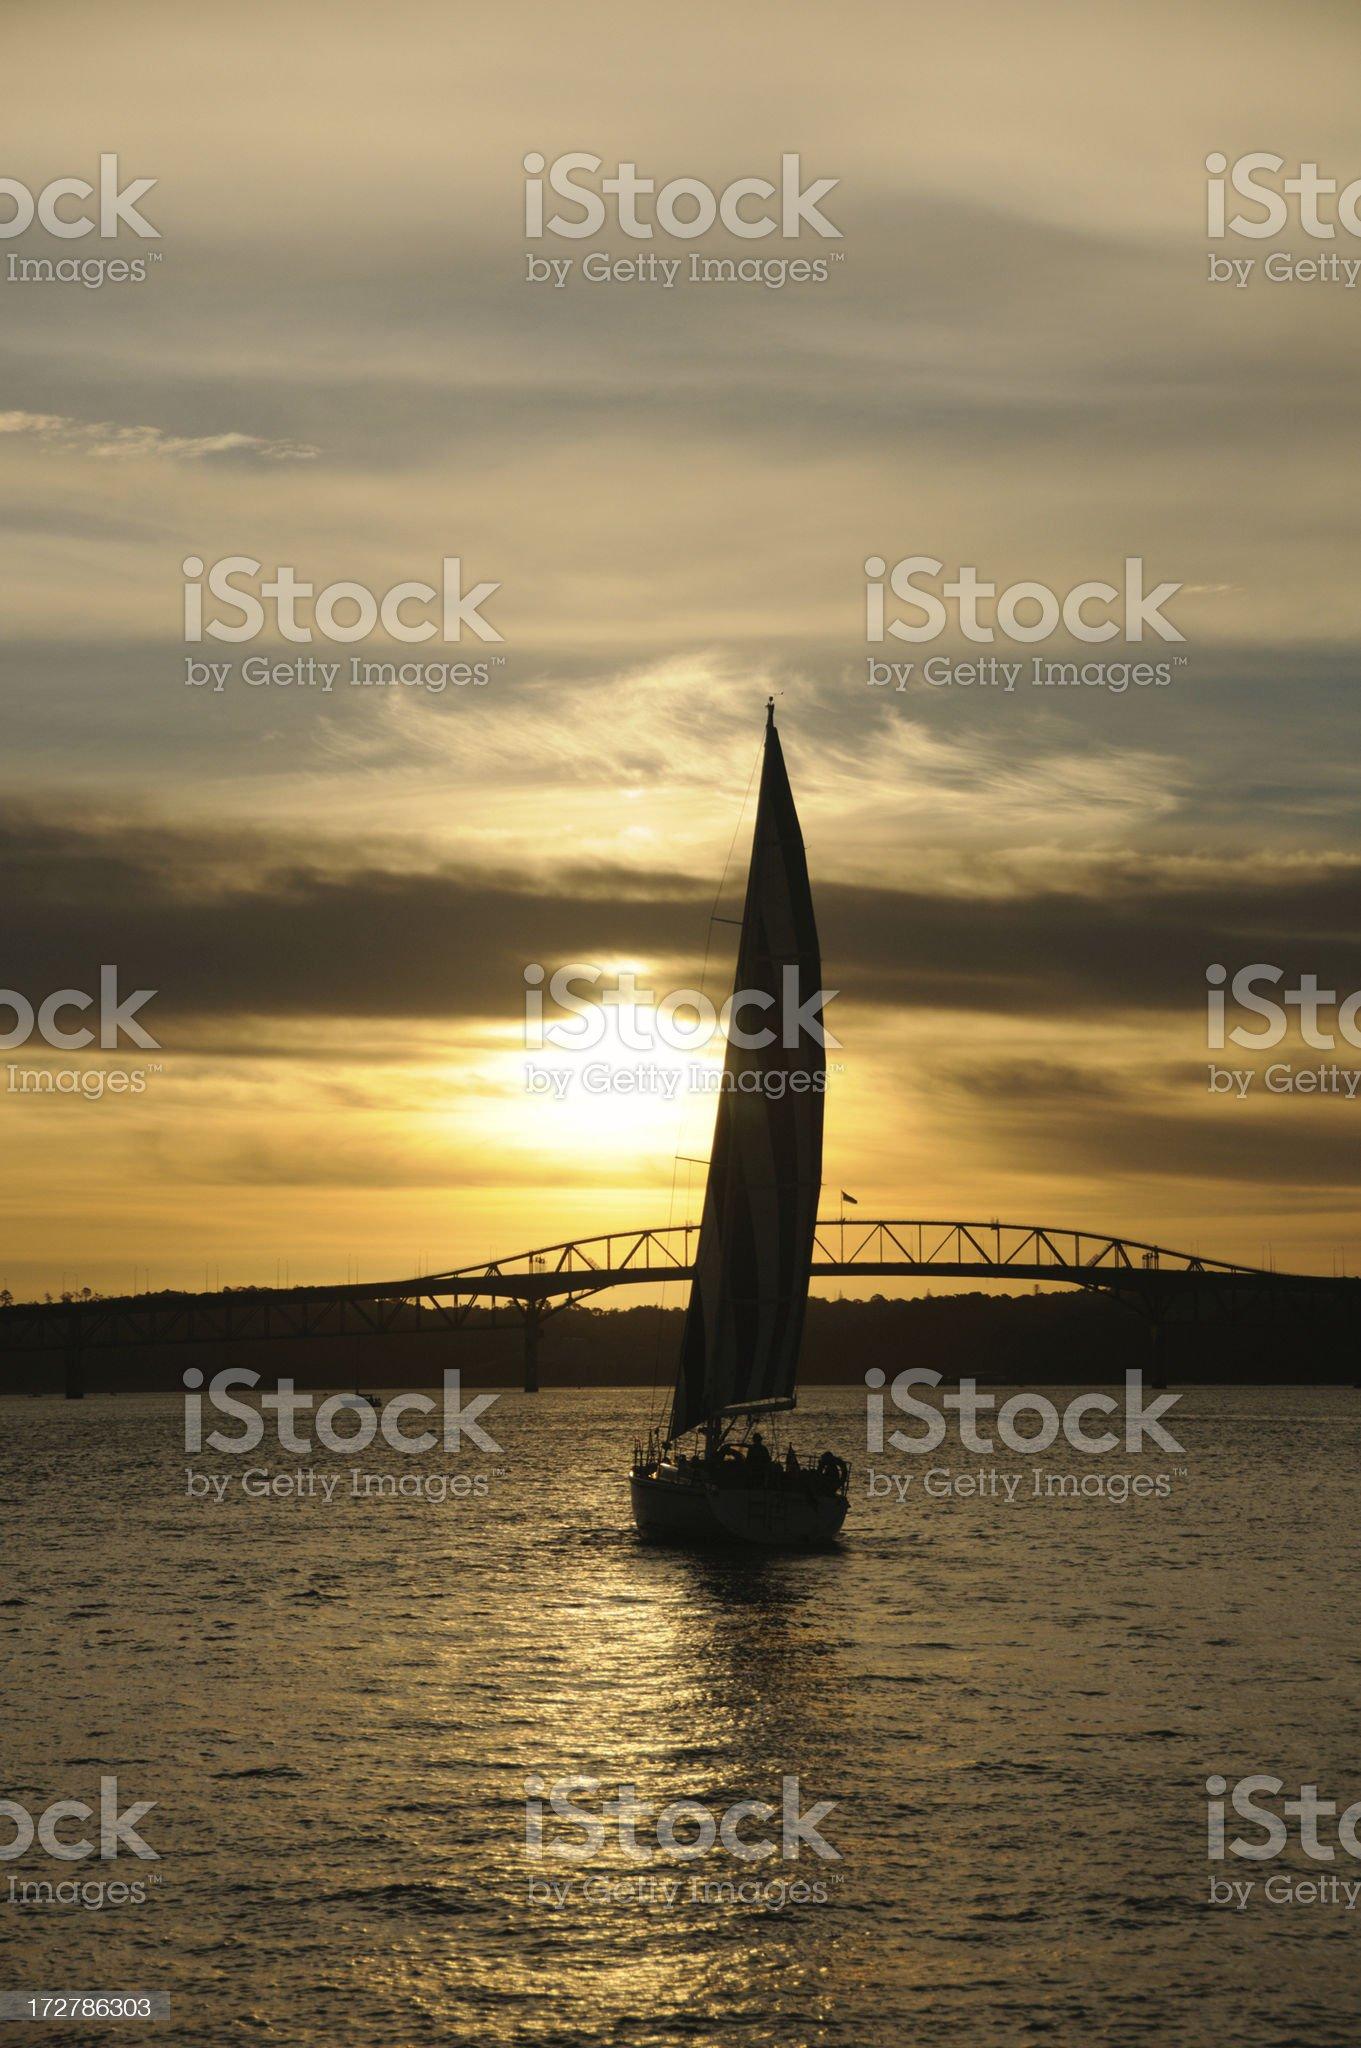 Sail to sunset royalty-free stock photo